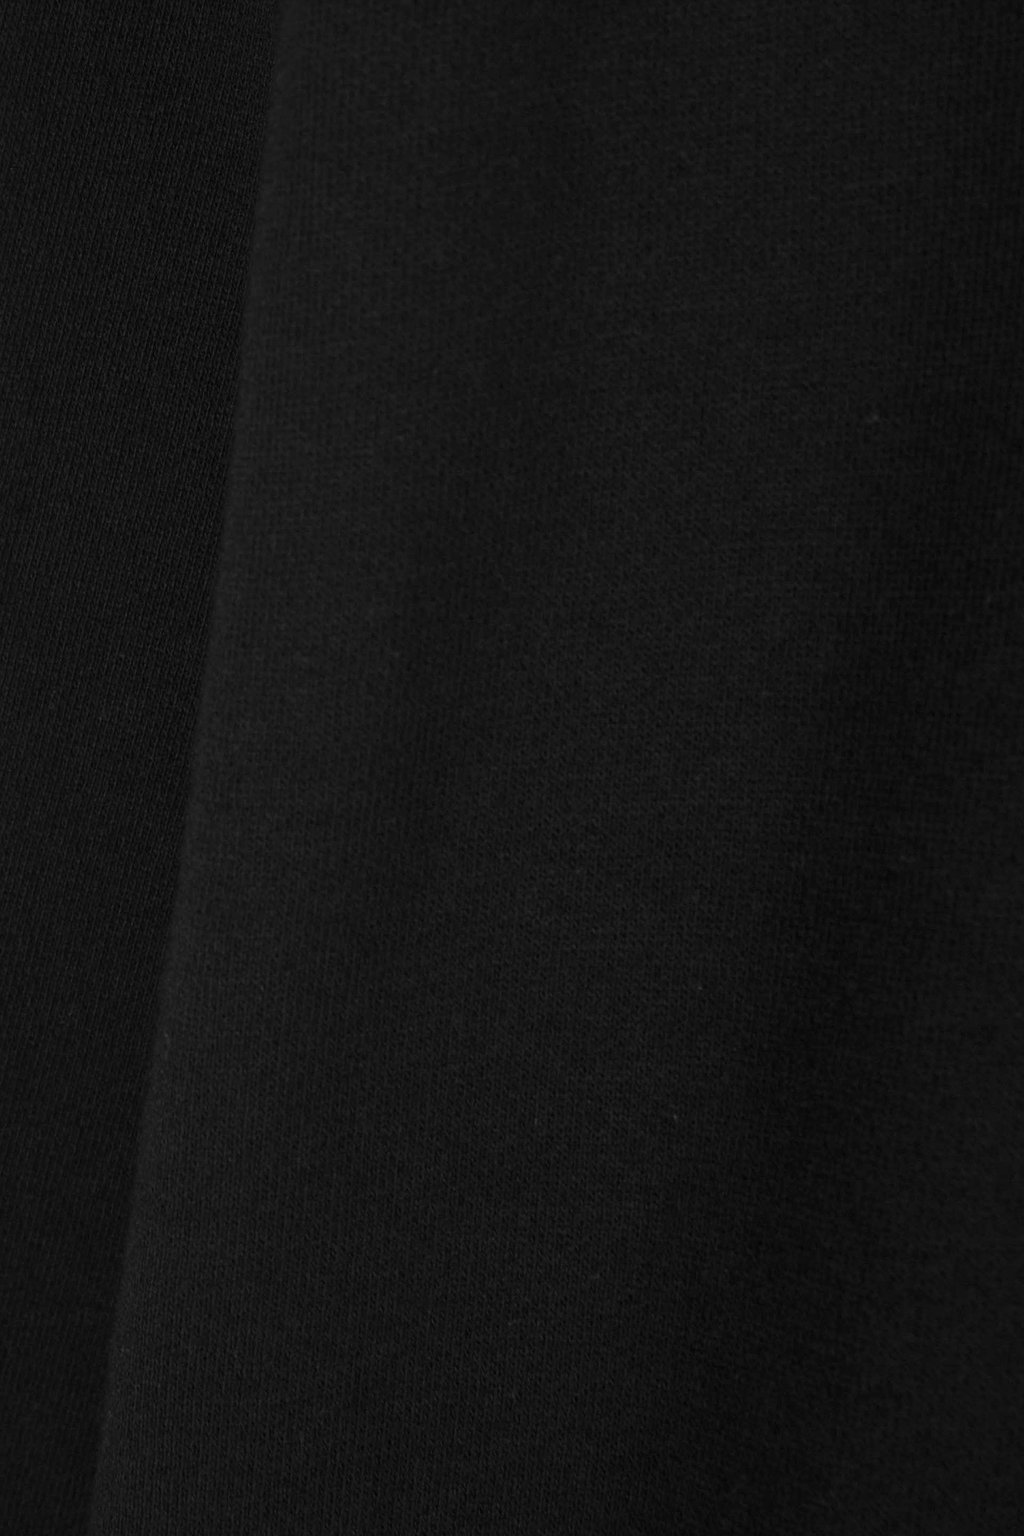 Sweatshirt H360 Black 13